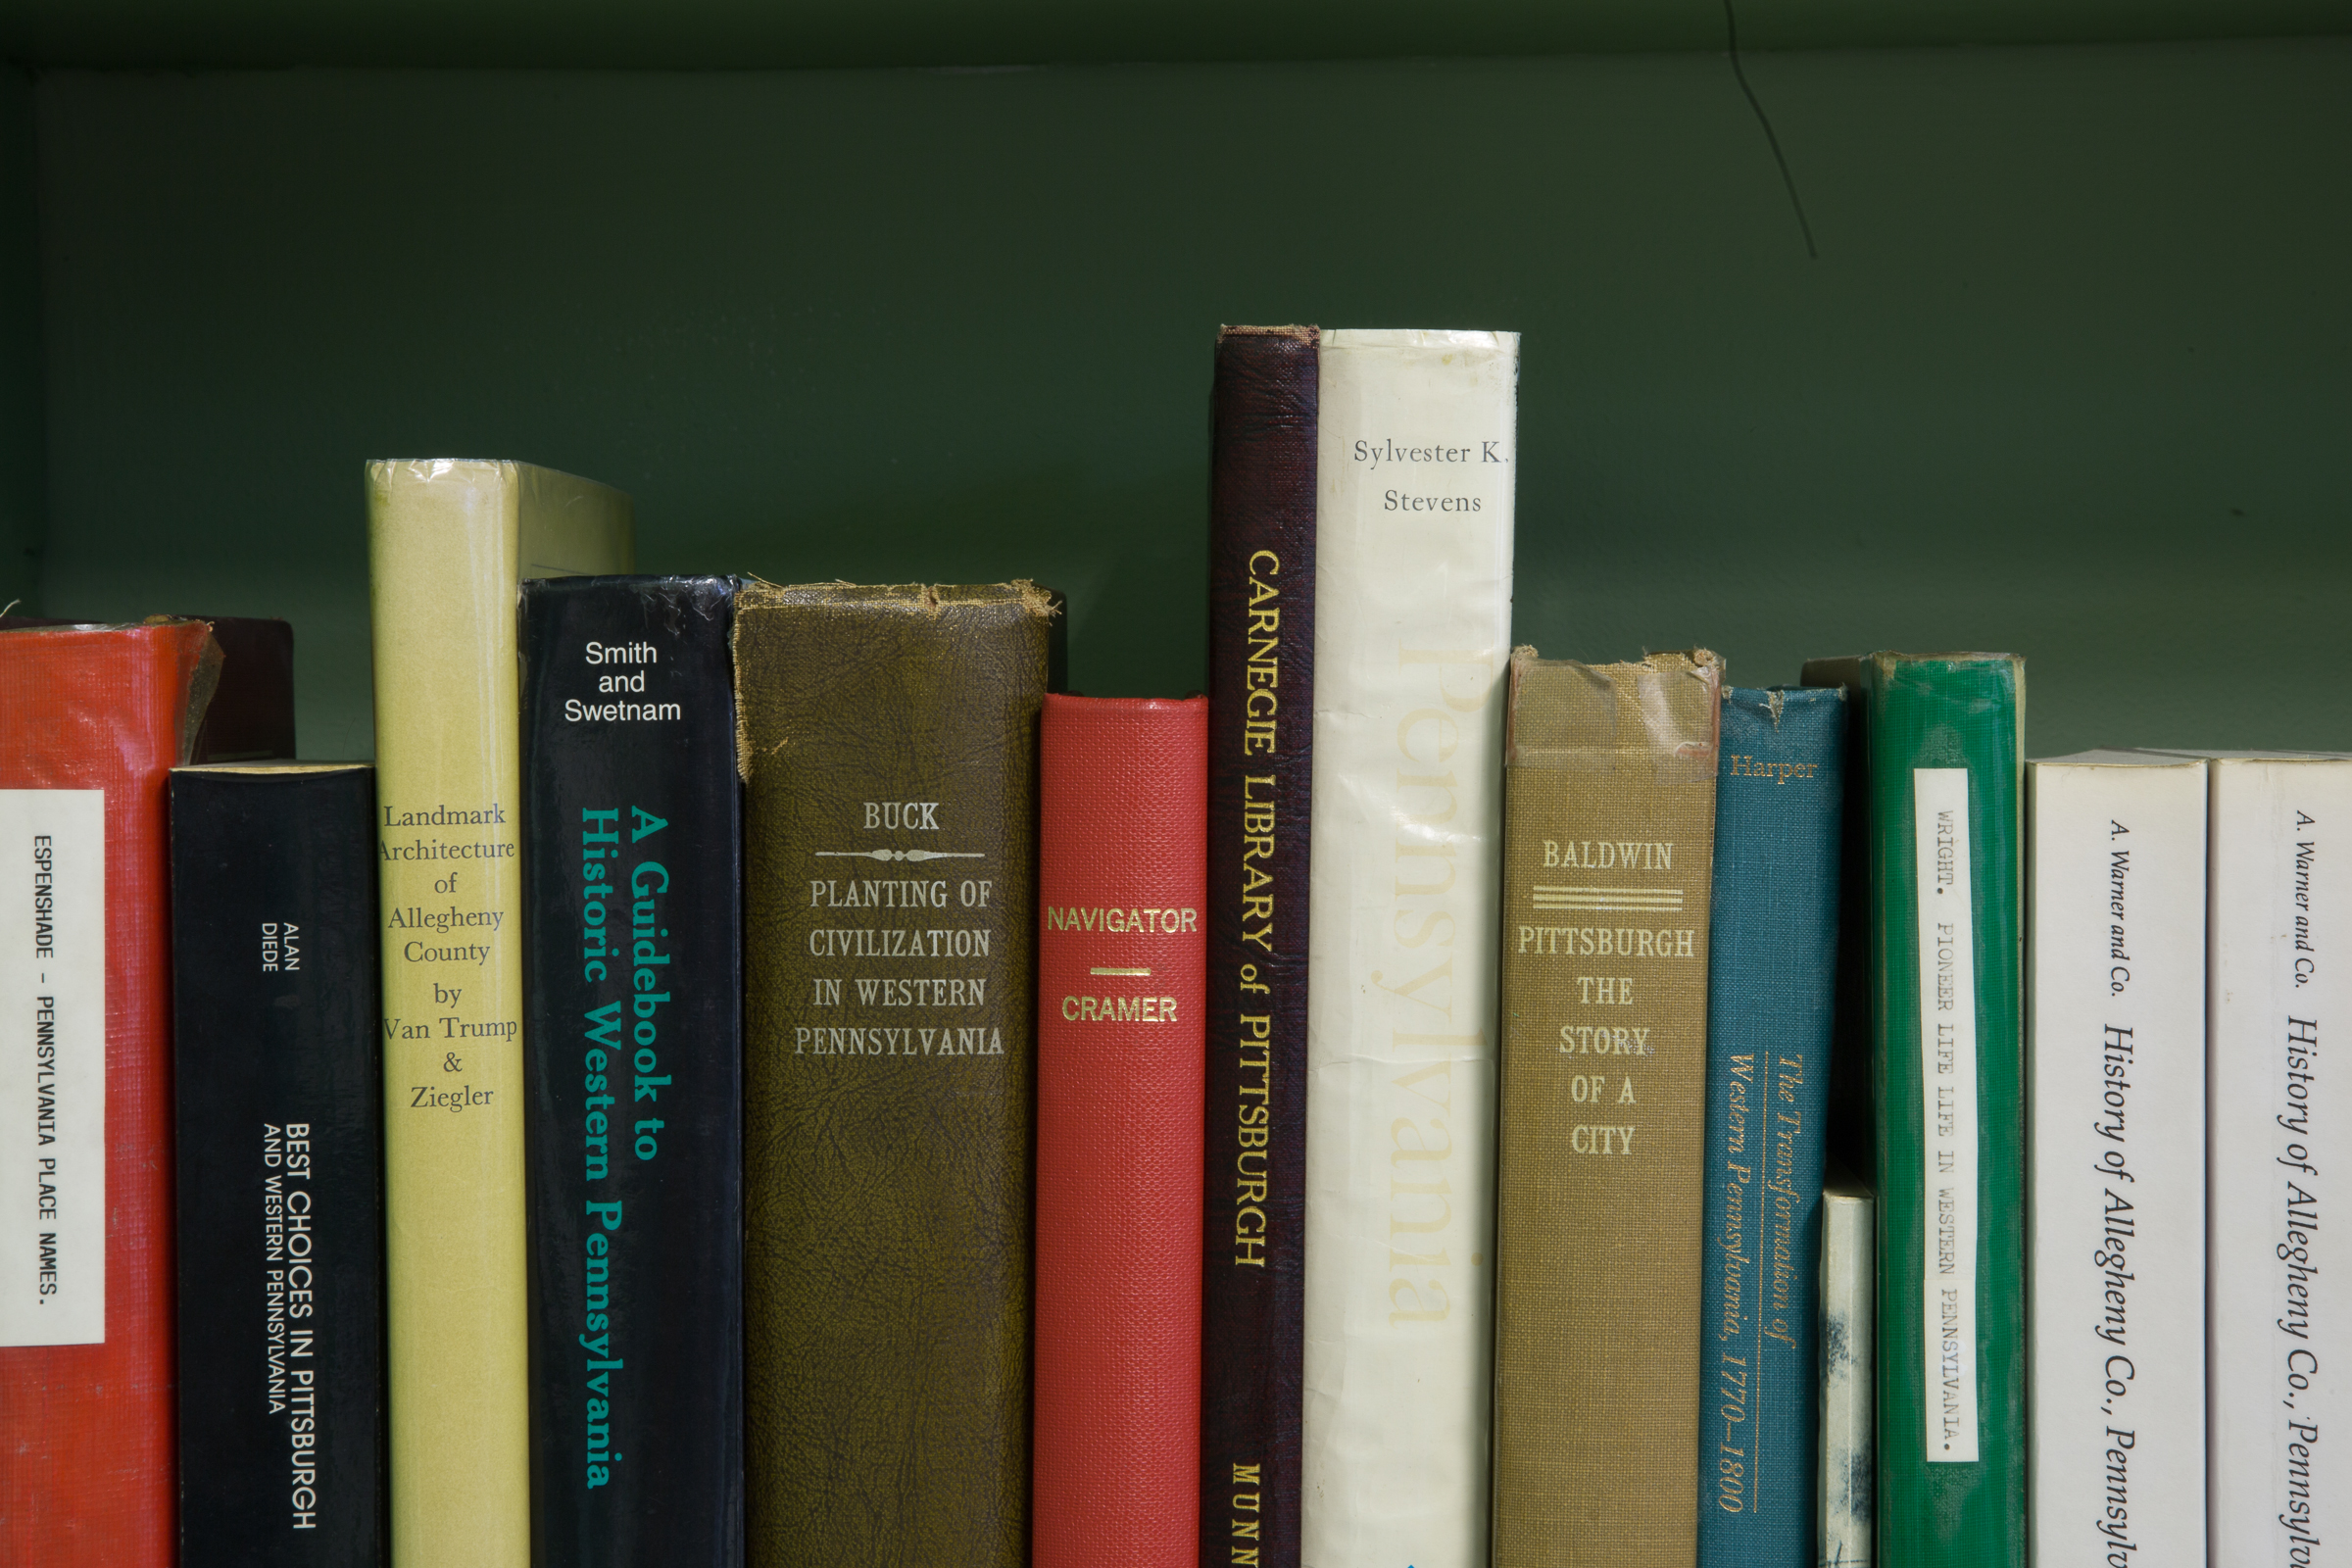 006_Library-26.jpg